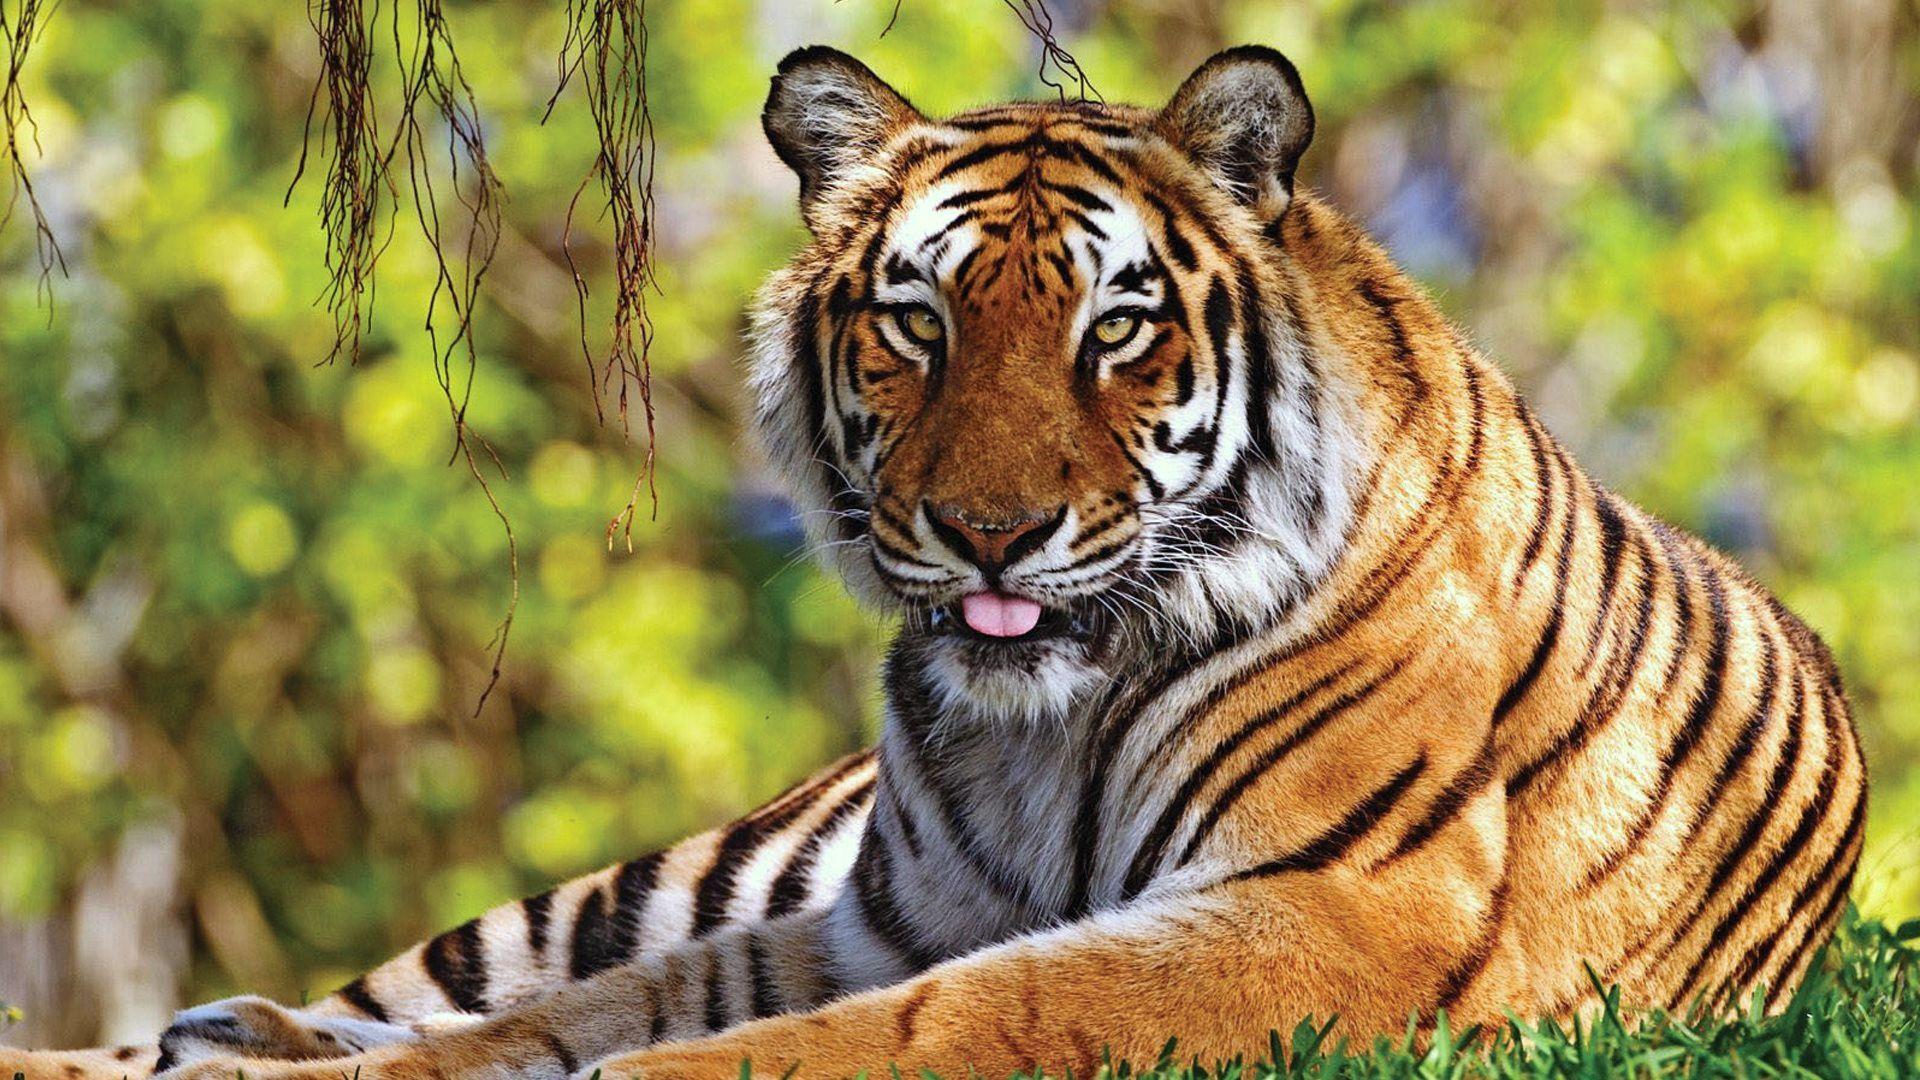 Download Tiger, Grass, Lie Down, Rest, Predator Wallpaper